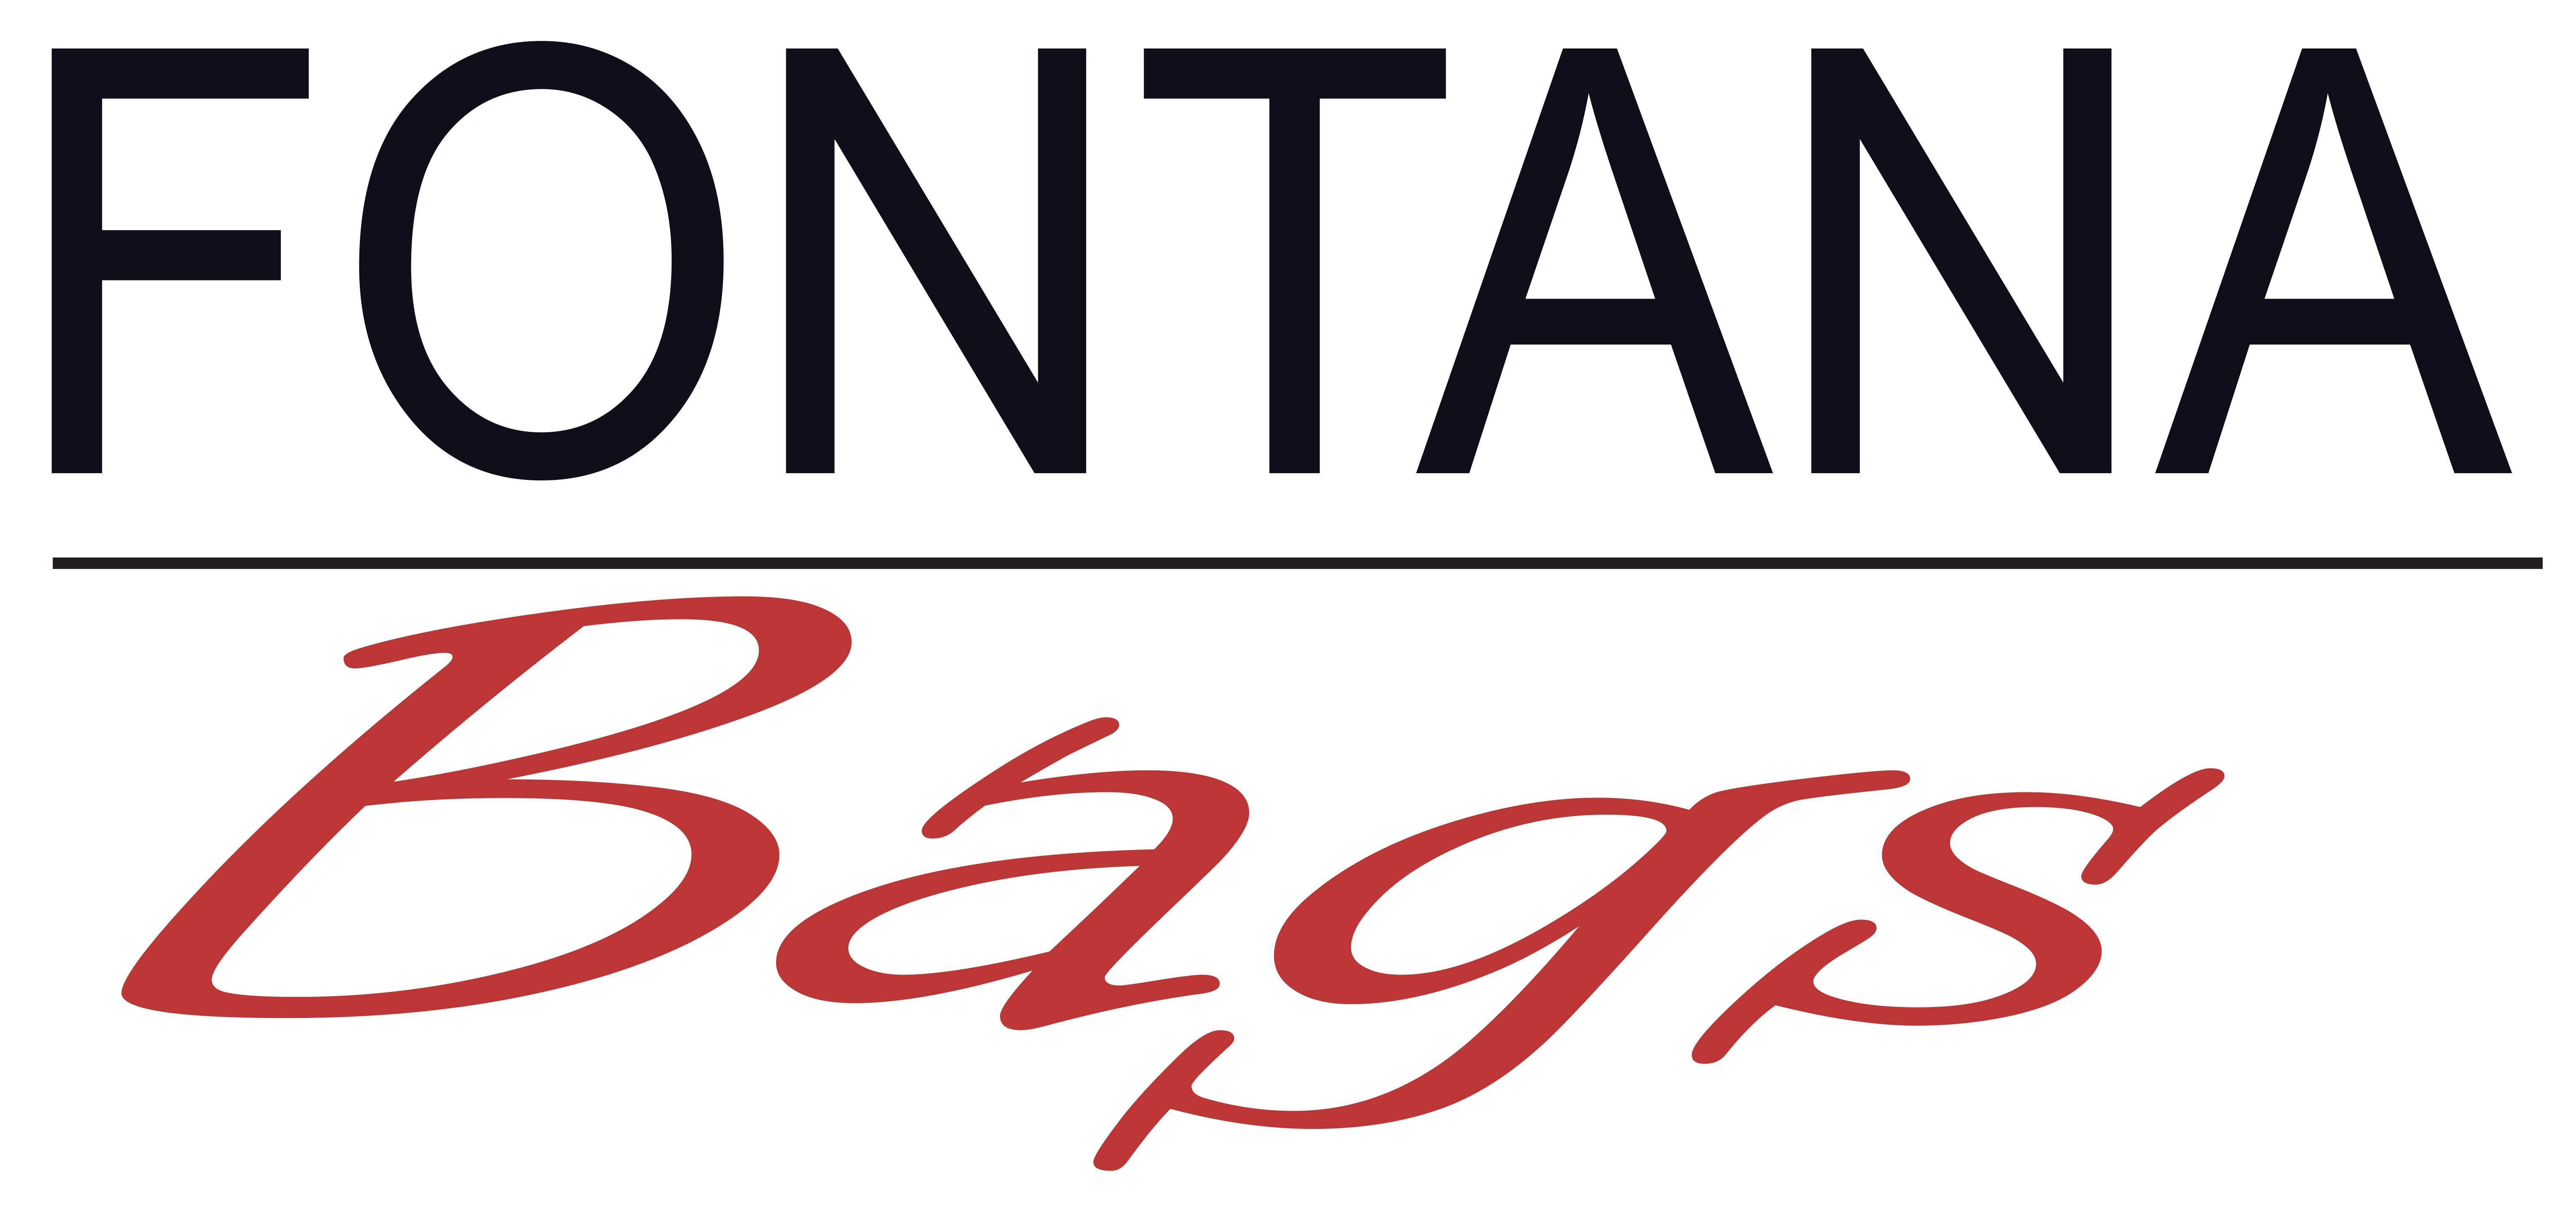 Fontana Bags, Borse & Valigie a Gallarate e Malpensa